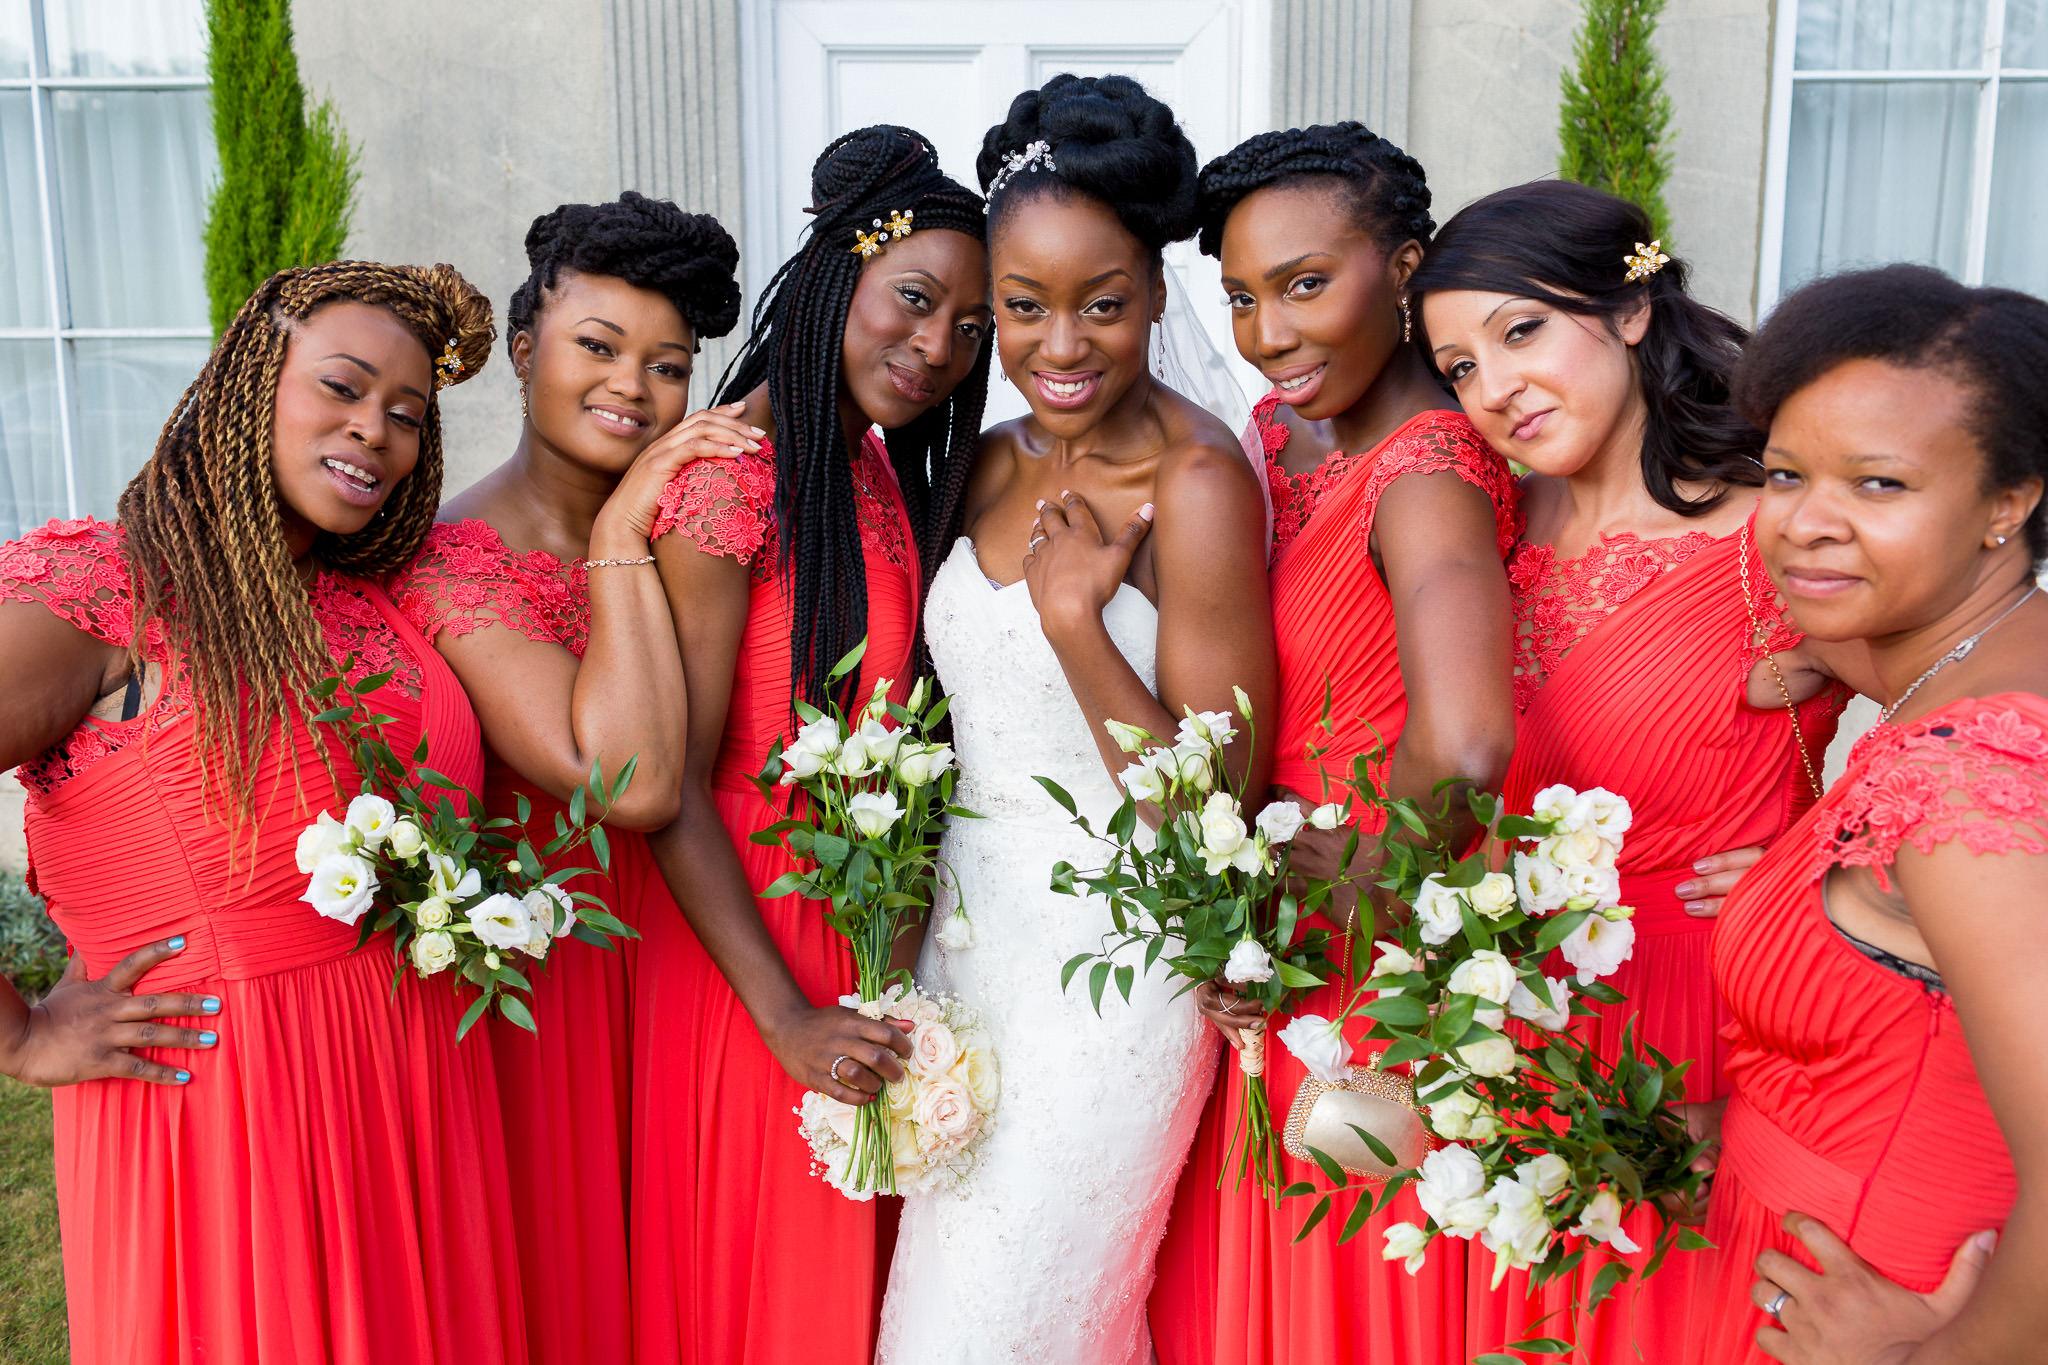 Addington Palace wedding bride and bridesmaids group photo